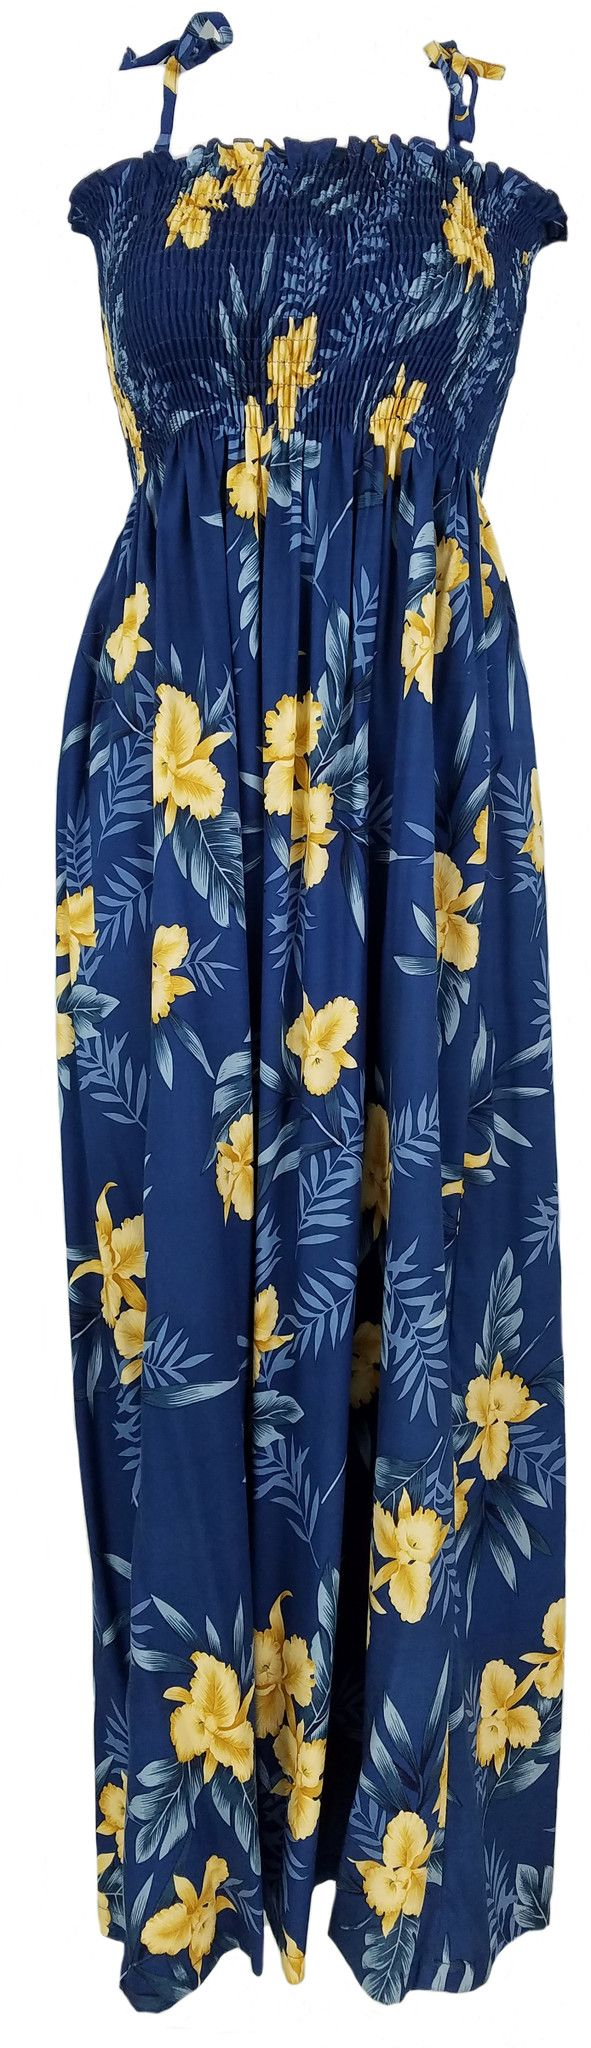 "Tube Top Dress Orchid Fern Blue 45"" Length"